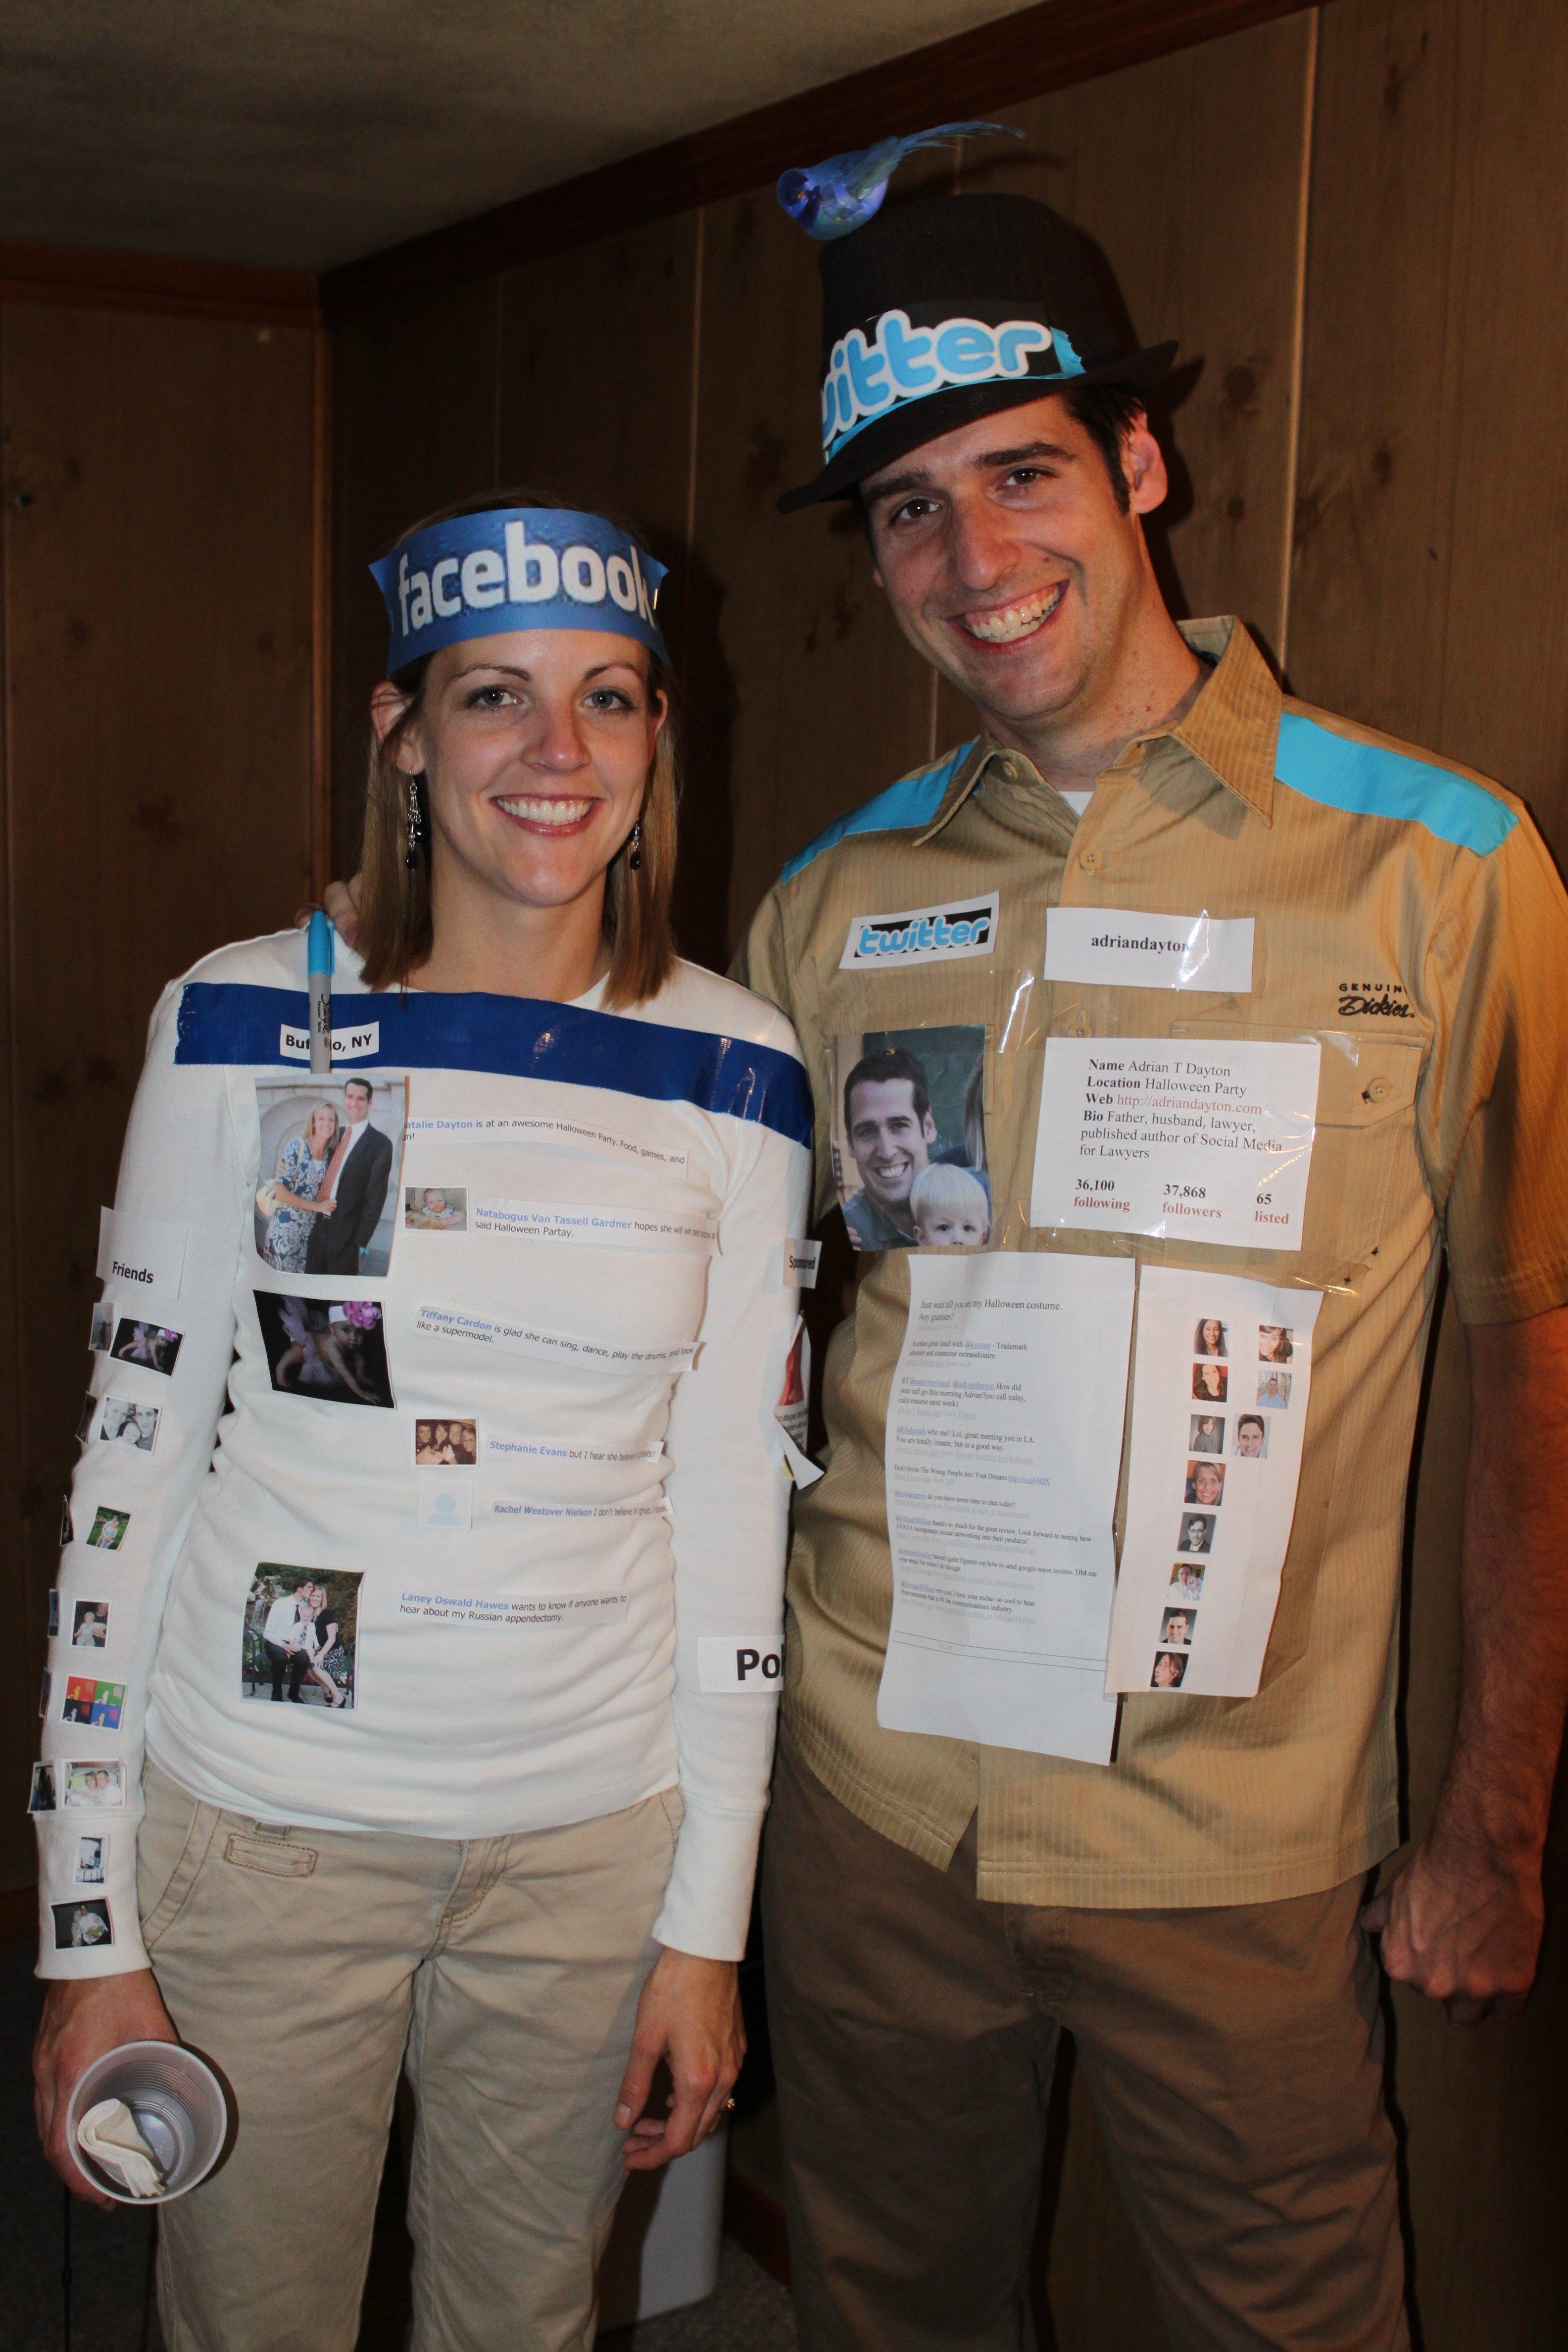 10 amazing best funny halloween costume ideas facebook and twitter funny halloween costume